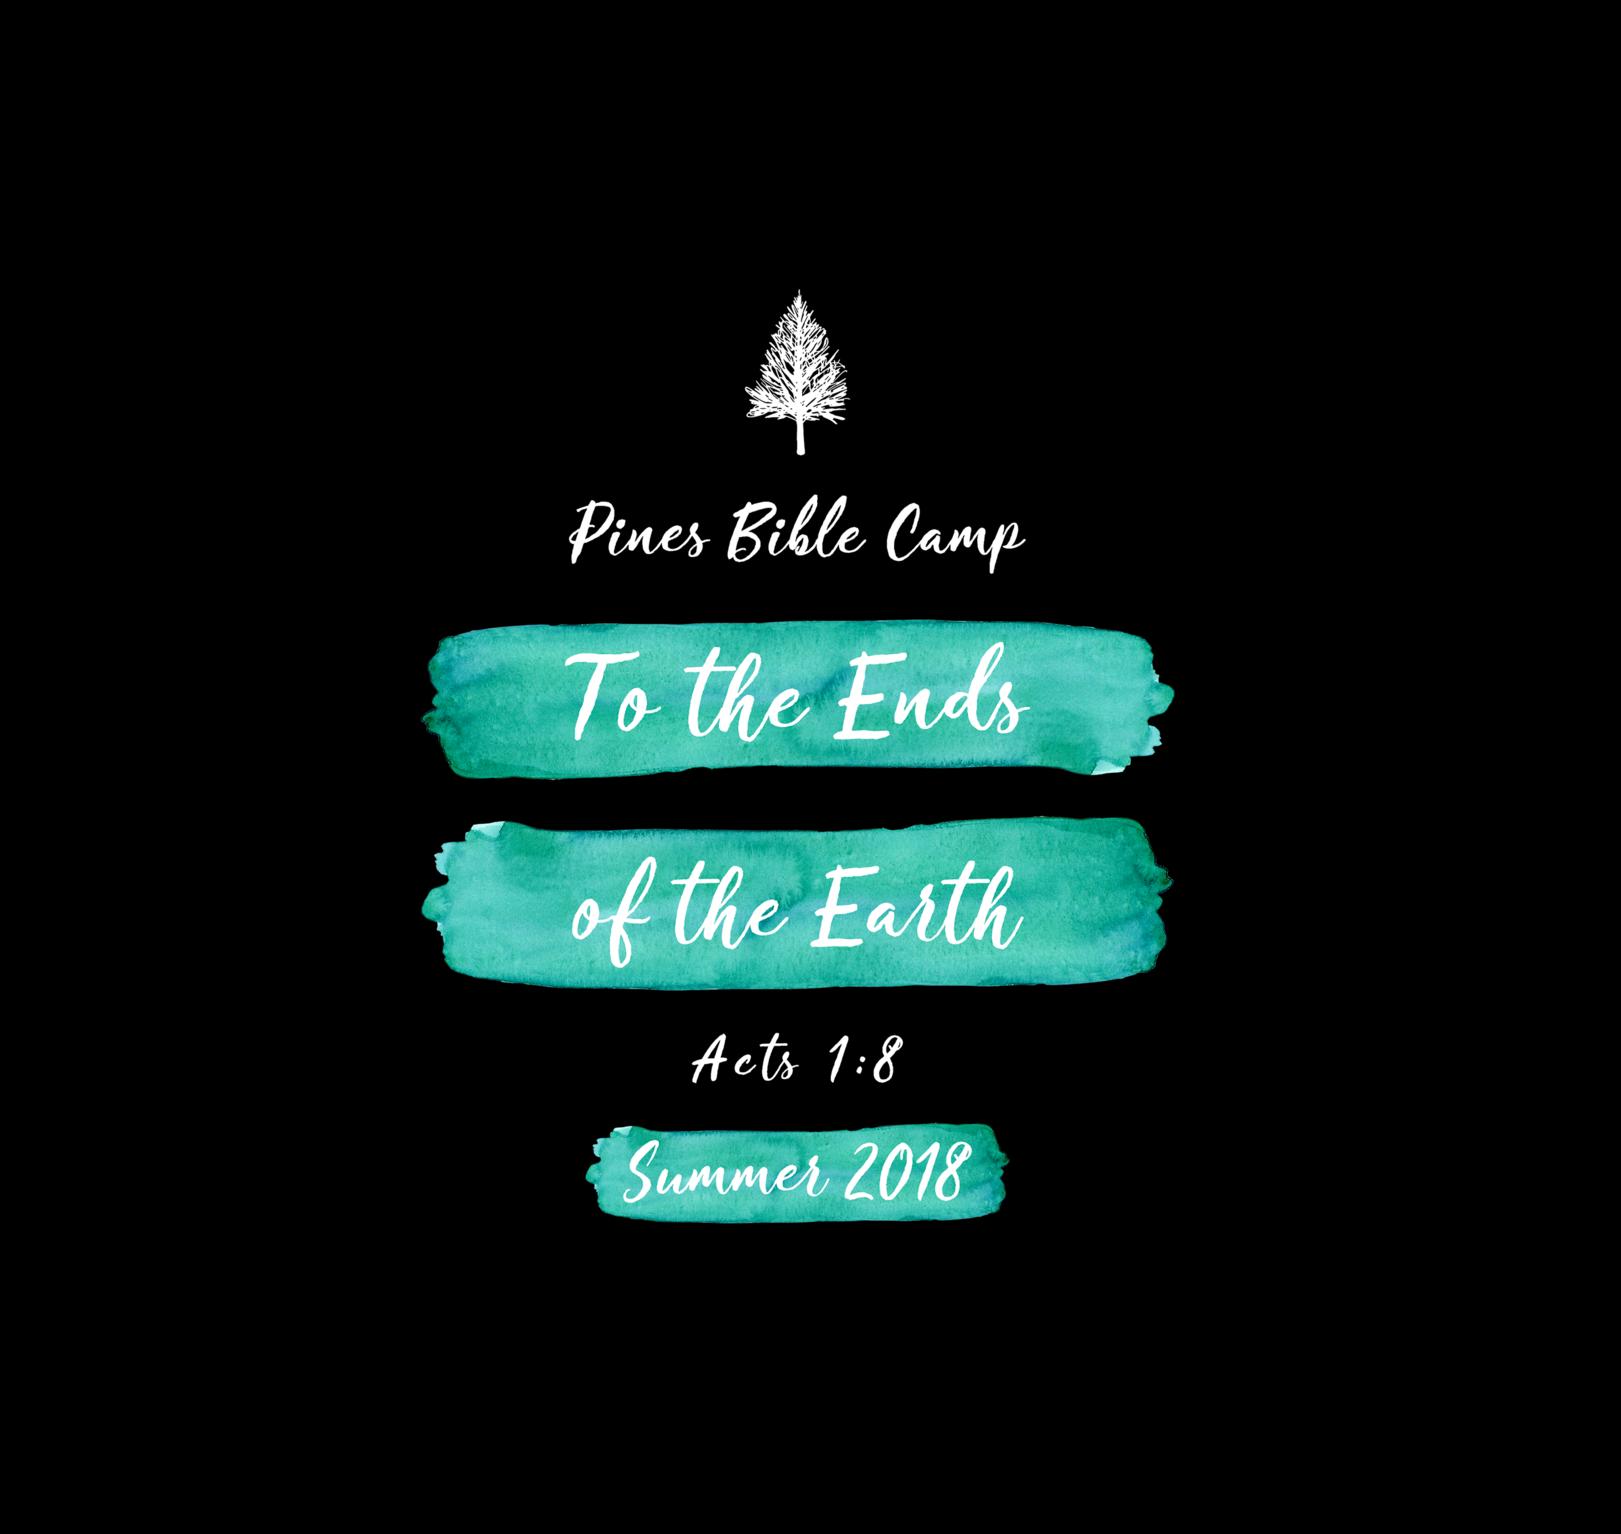 Pines bible camp - Summer 2018 logo